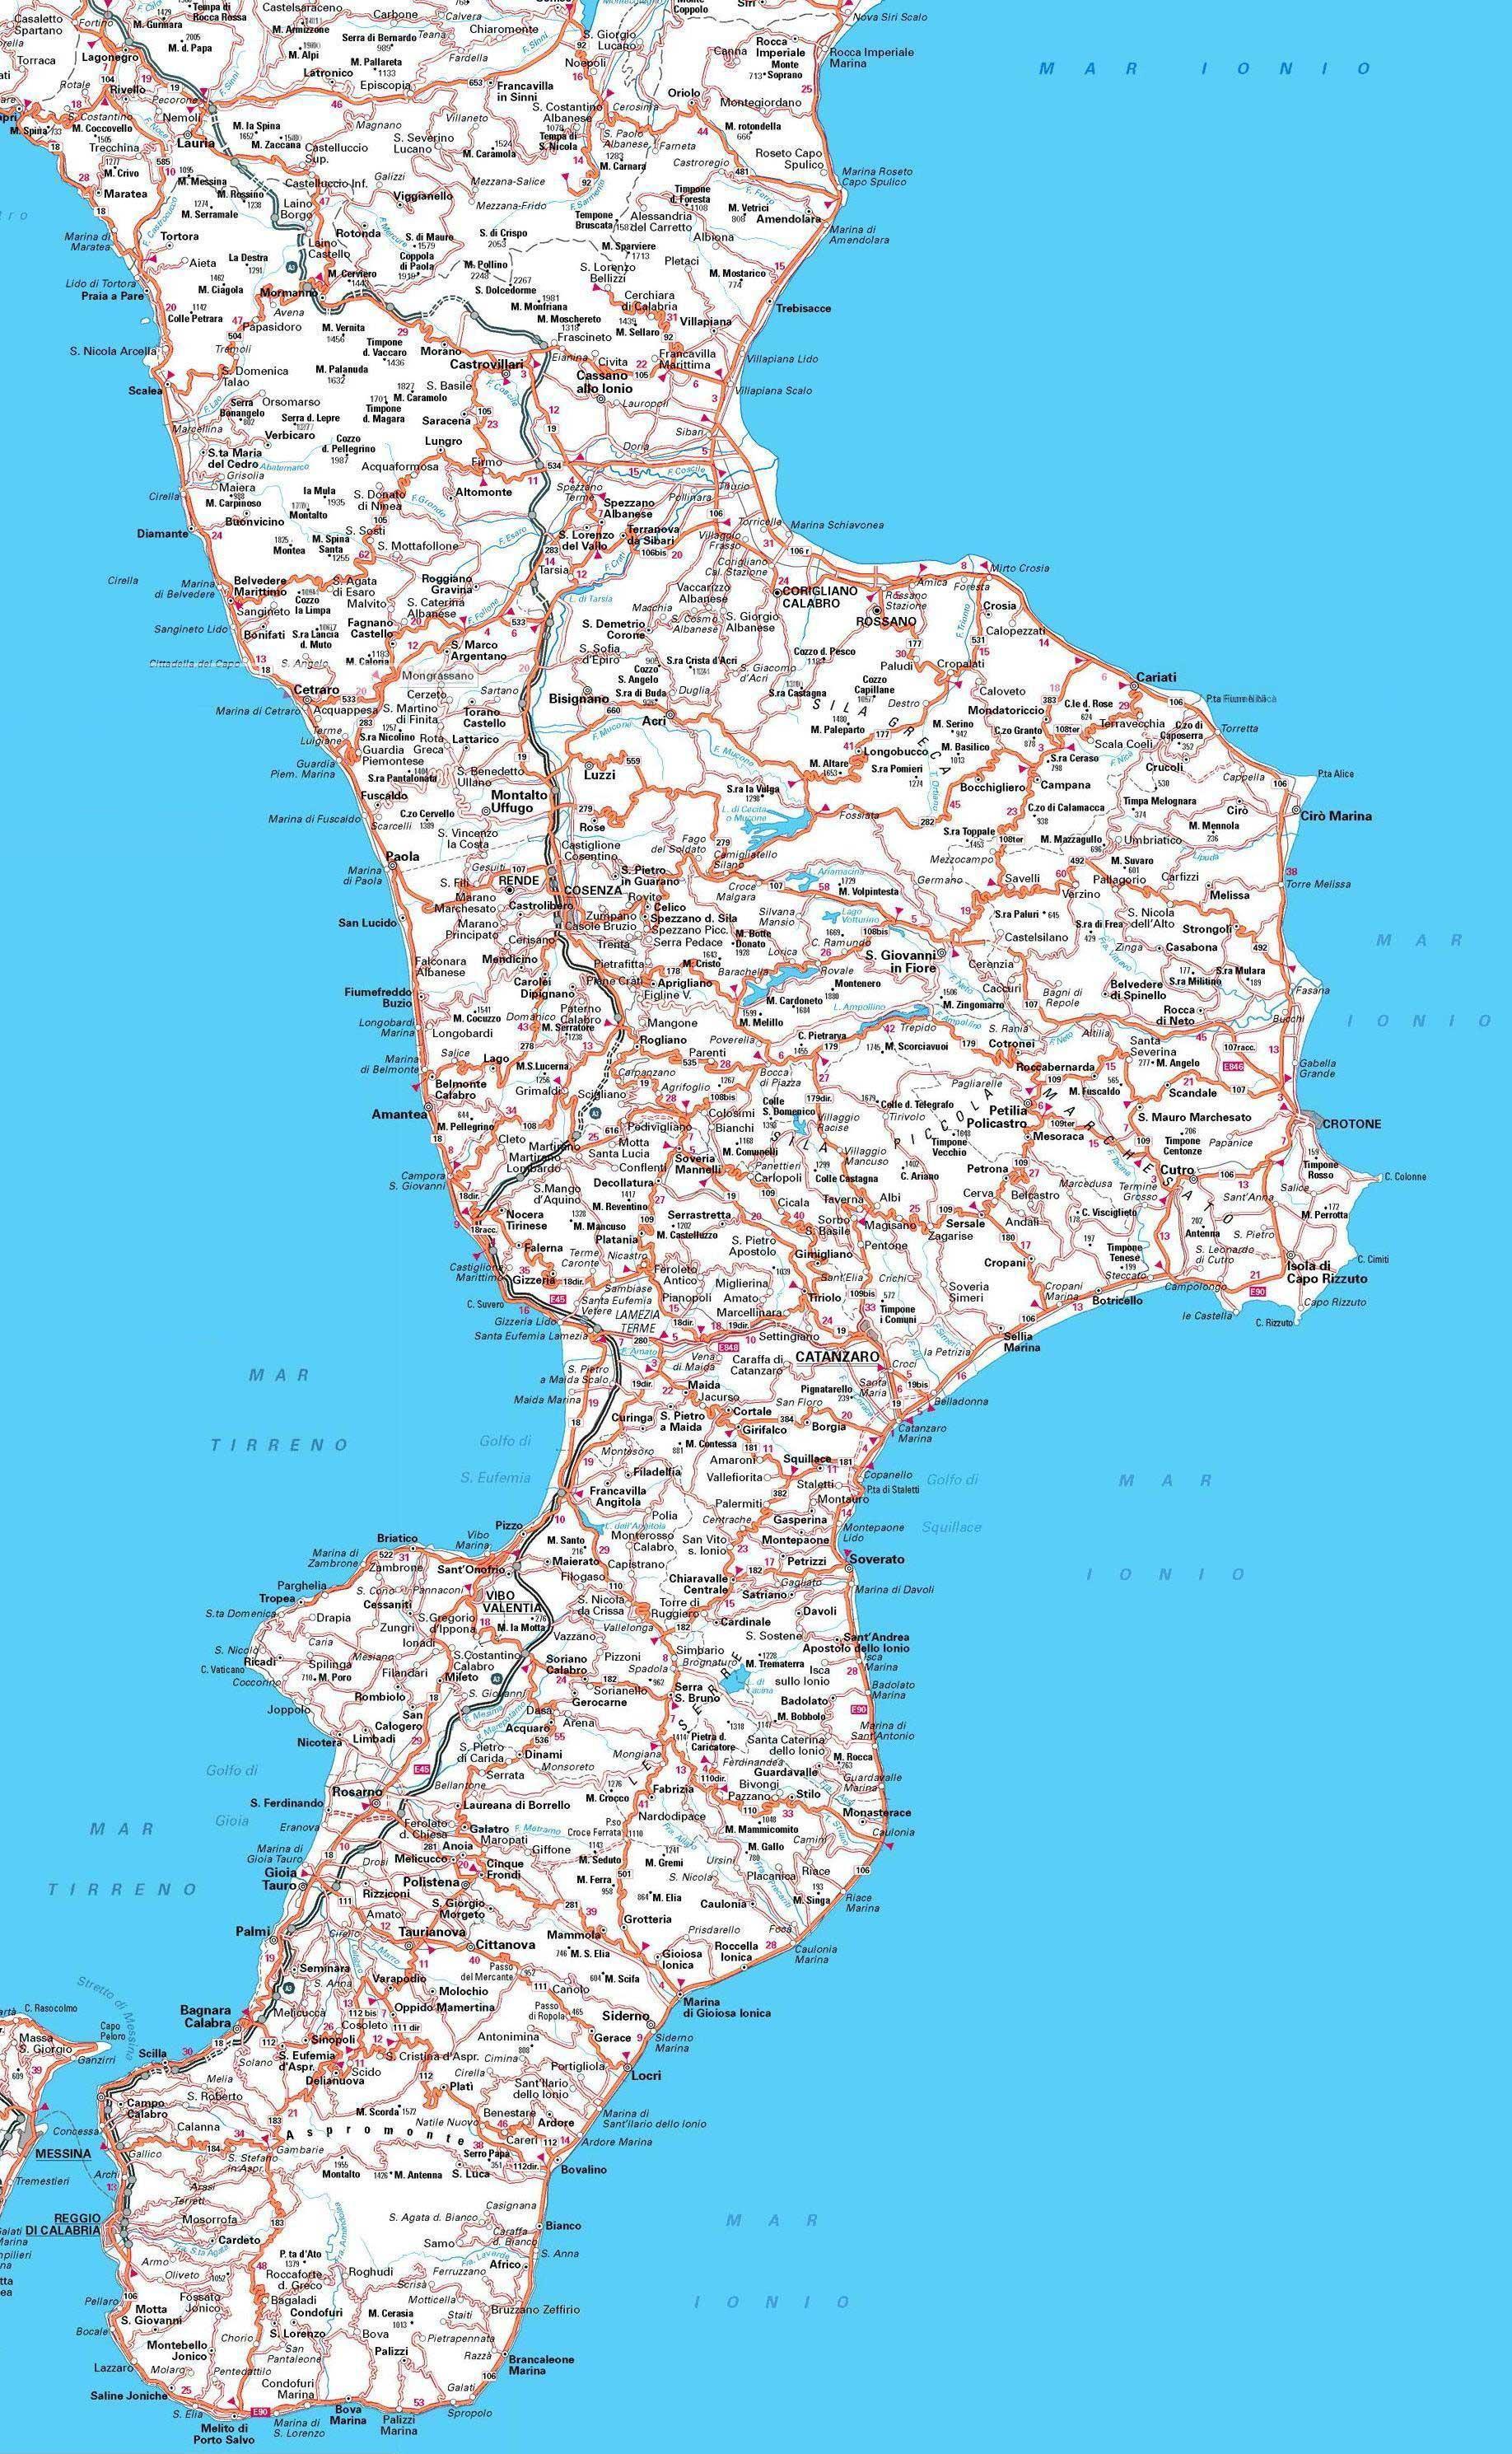 Cartina Stradale Basilicata Puglia.Calabria Carta Stradale